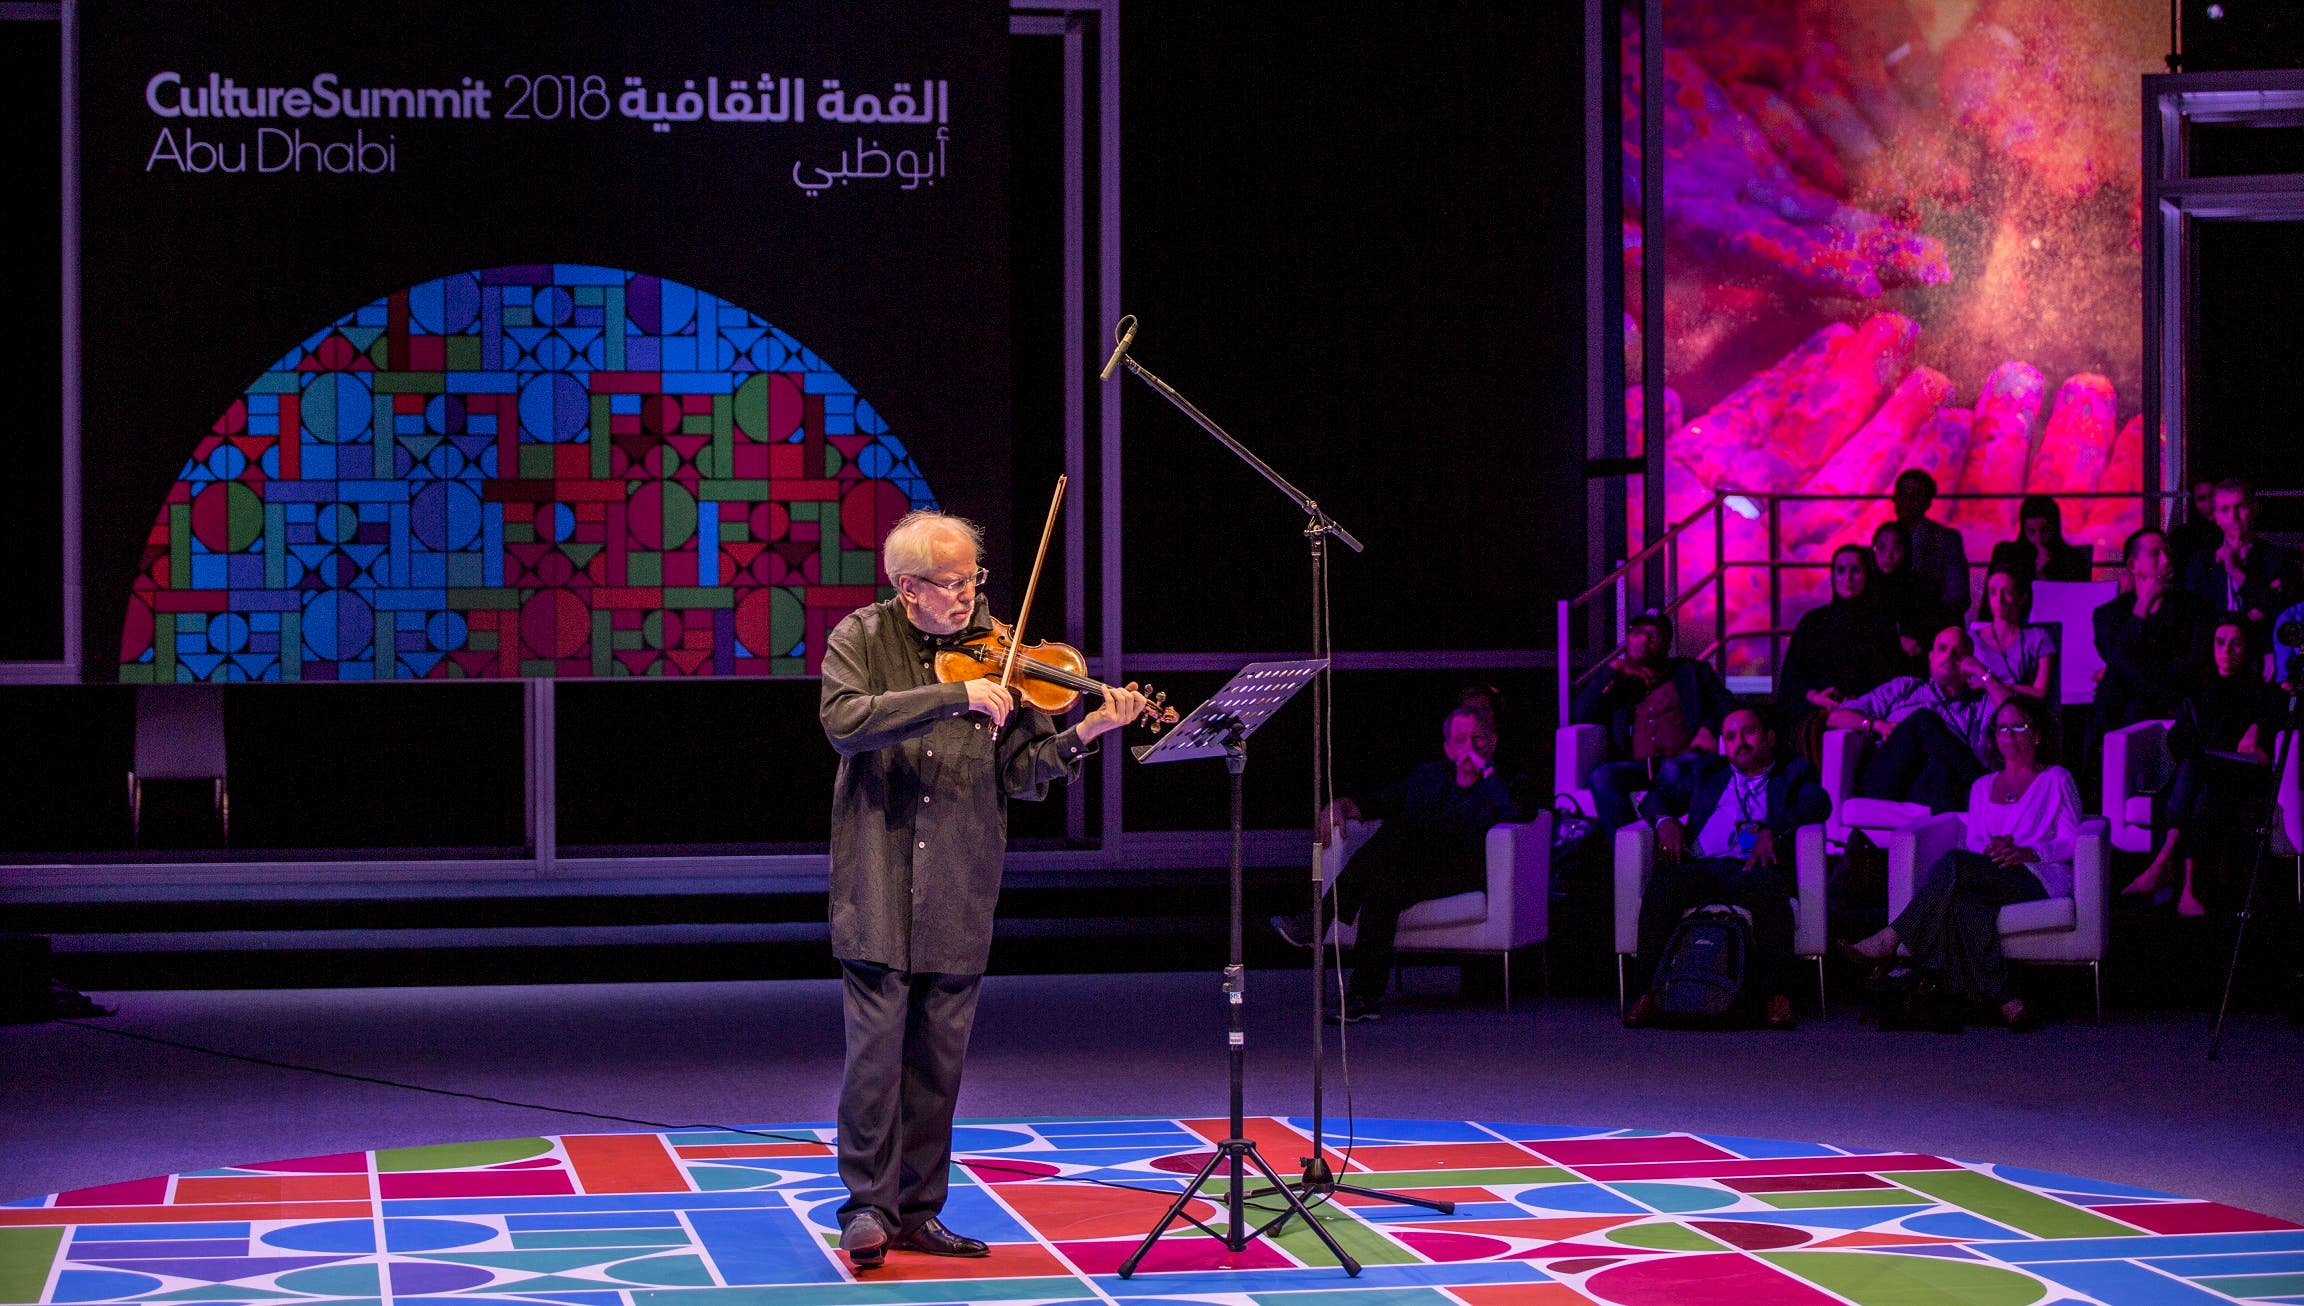 Gidon Kremer performing at the Culture Summit Abu Dhabi. (Supplied)